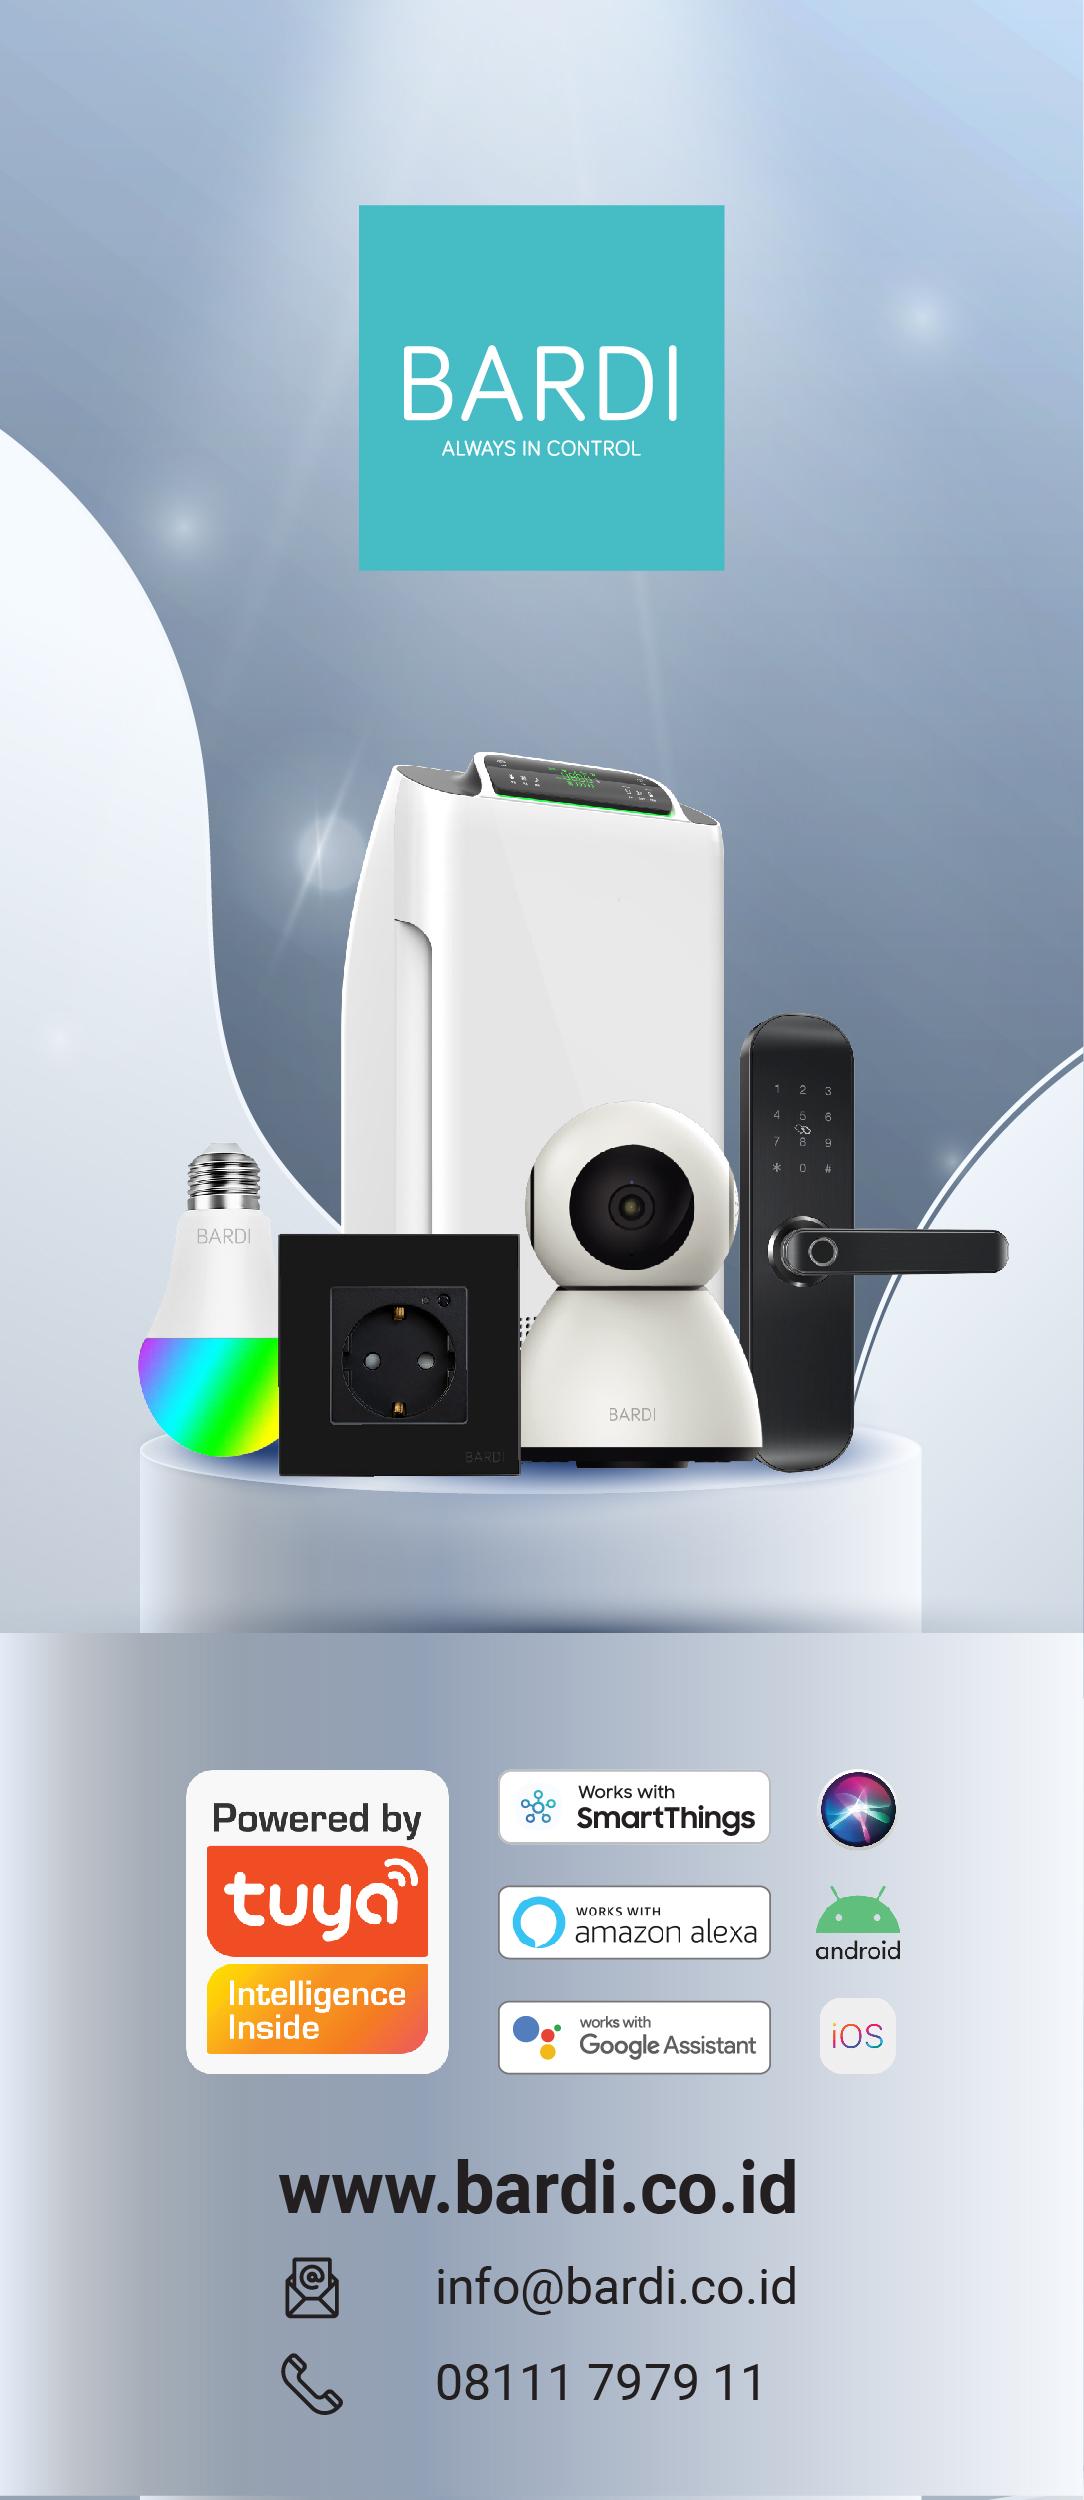 BARDI-Banner-260x600pixel.jpg